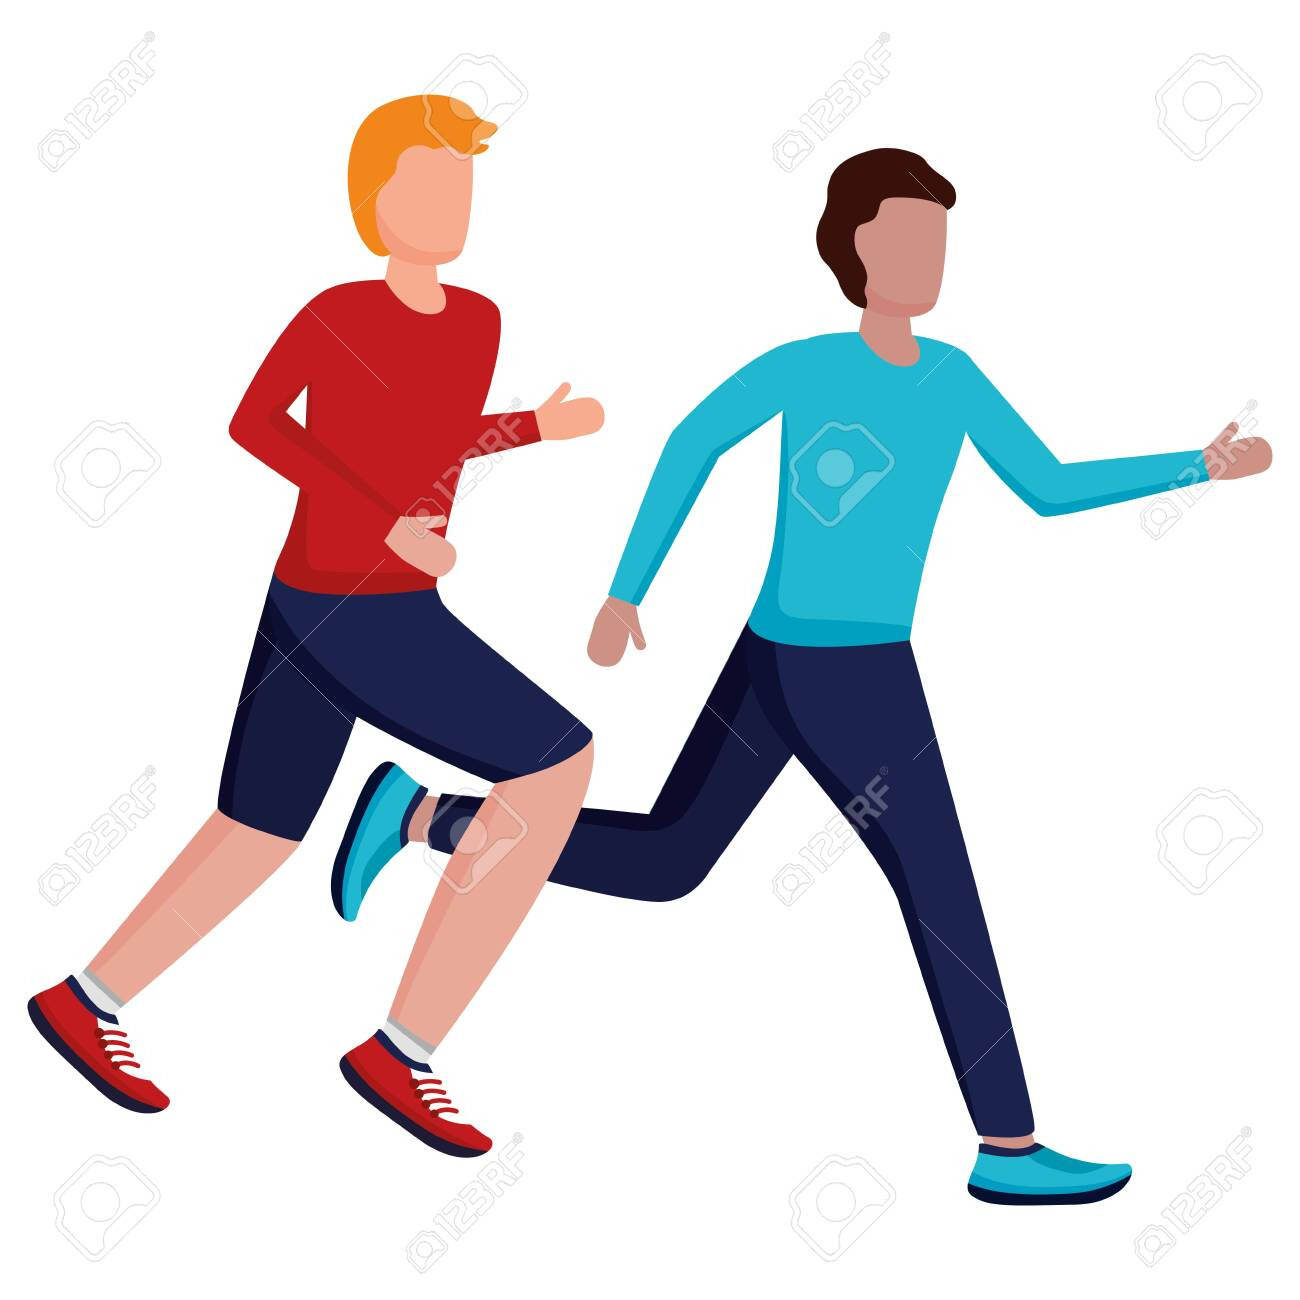 two men practicing running activity vector illustration - 130009236